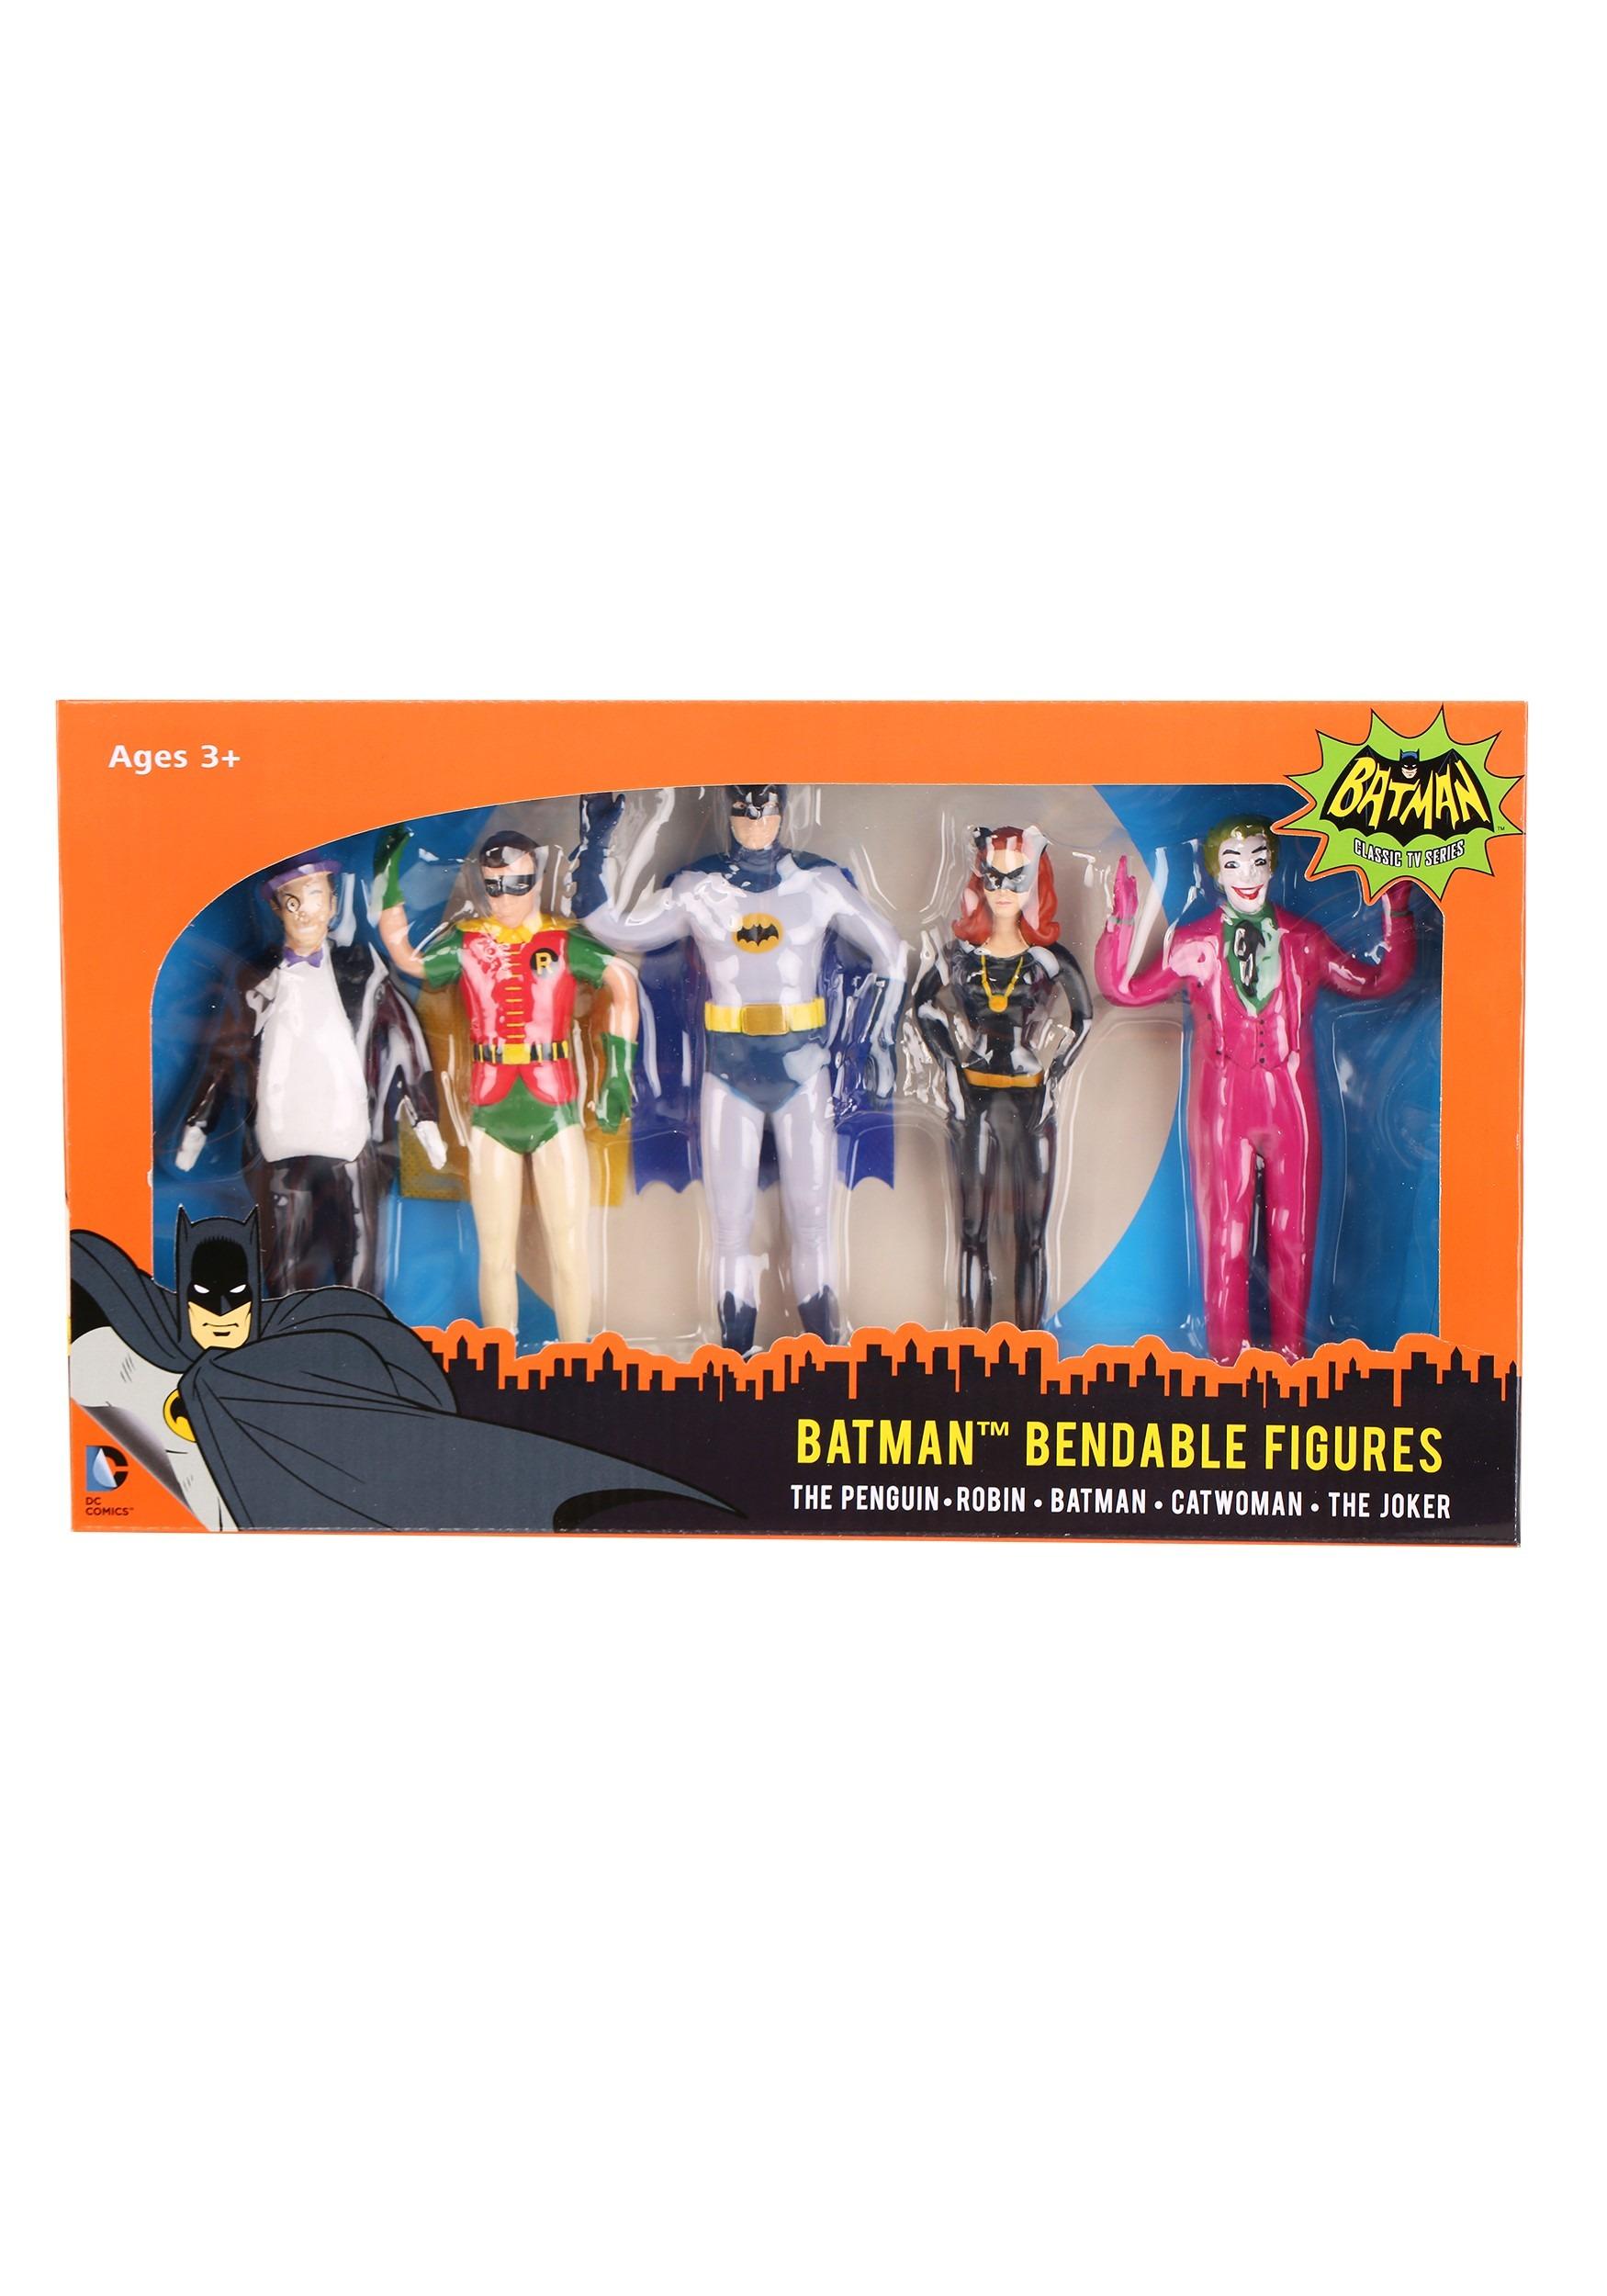 Batman Bendable Figures Boxed Set NJCDC3920